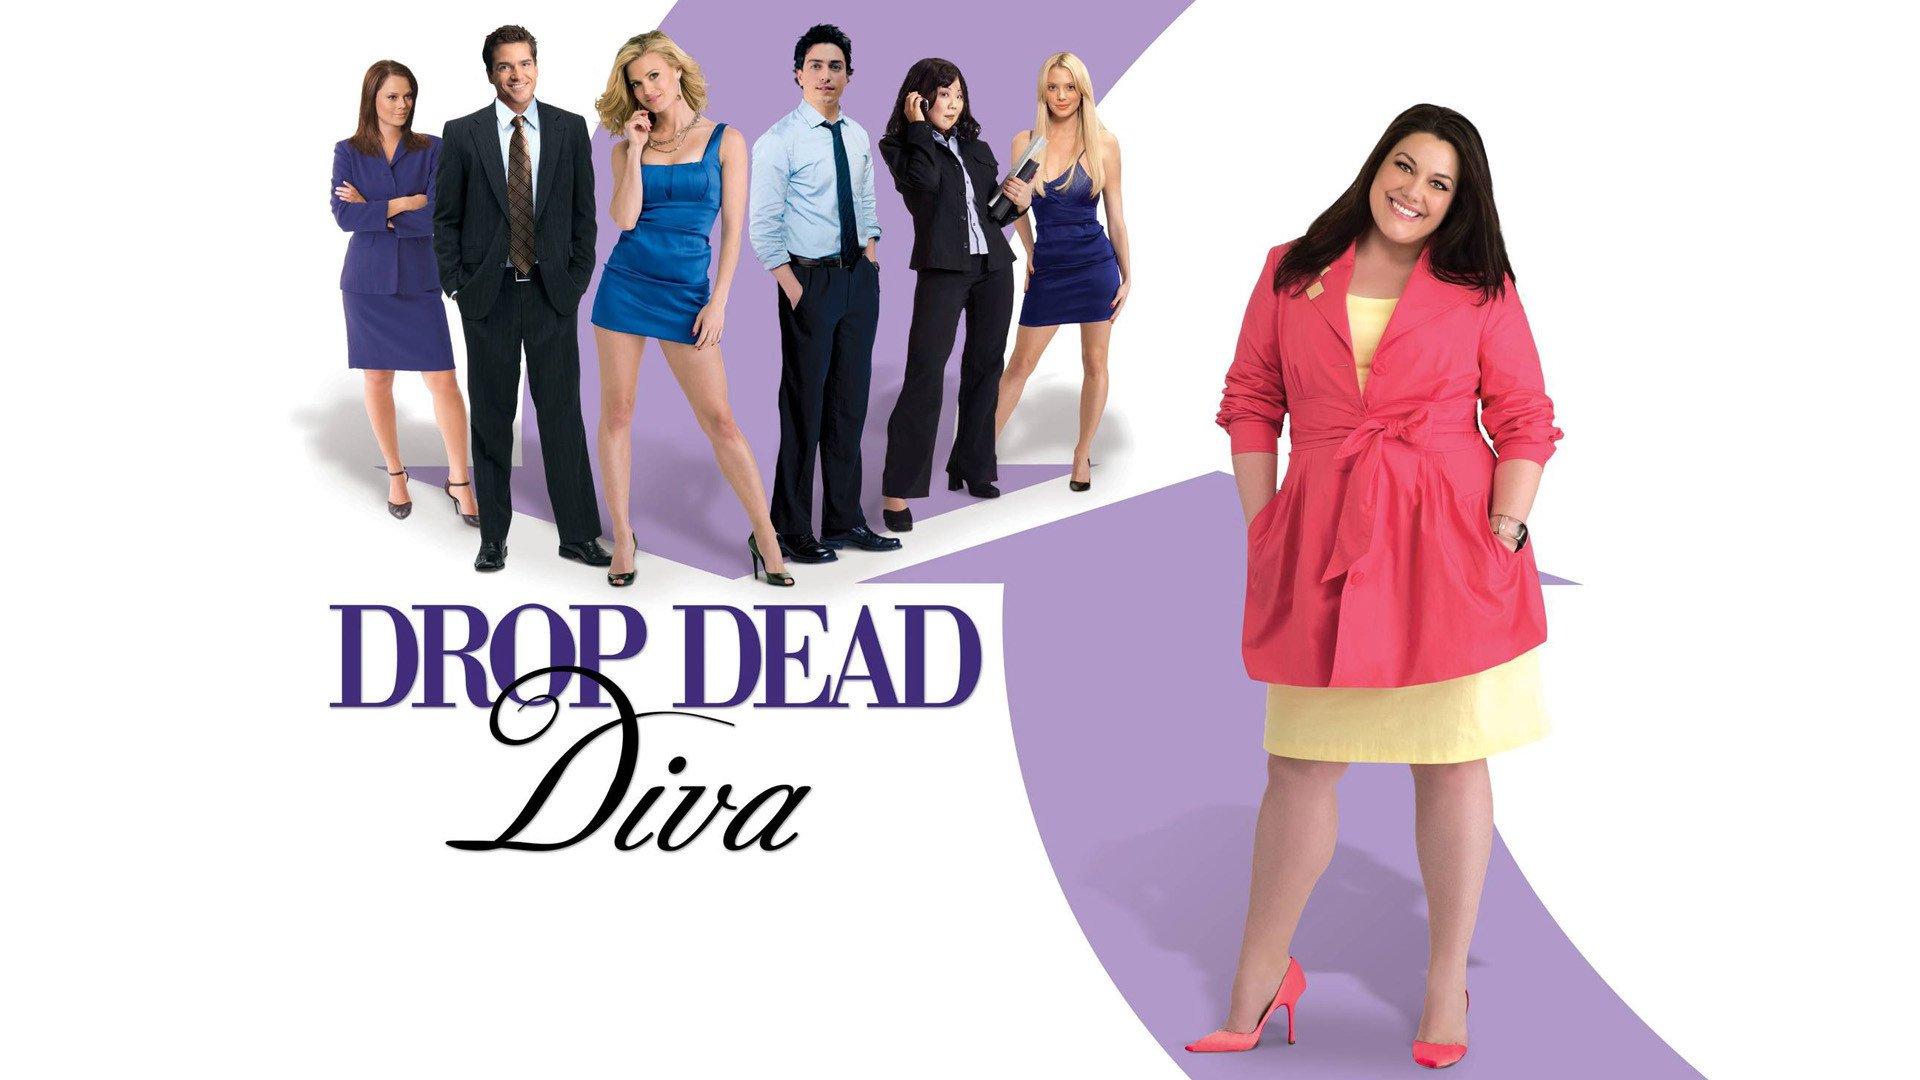 Drop dead diva 2009 - Paul drop dead diva ...